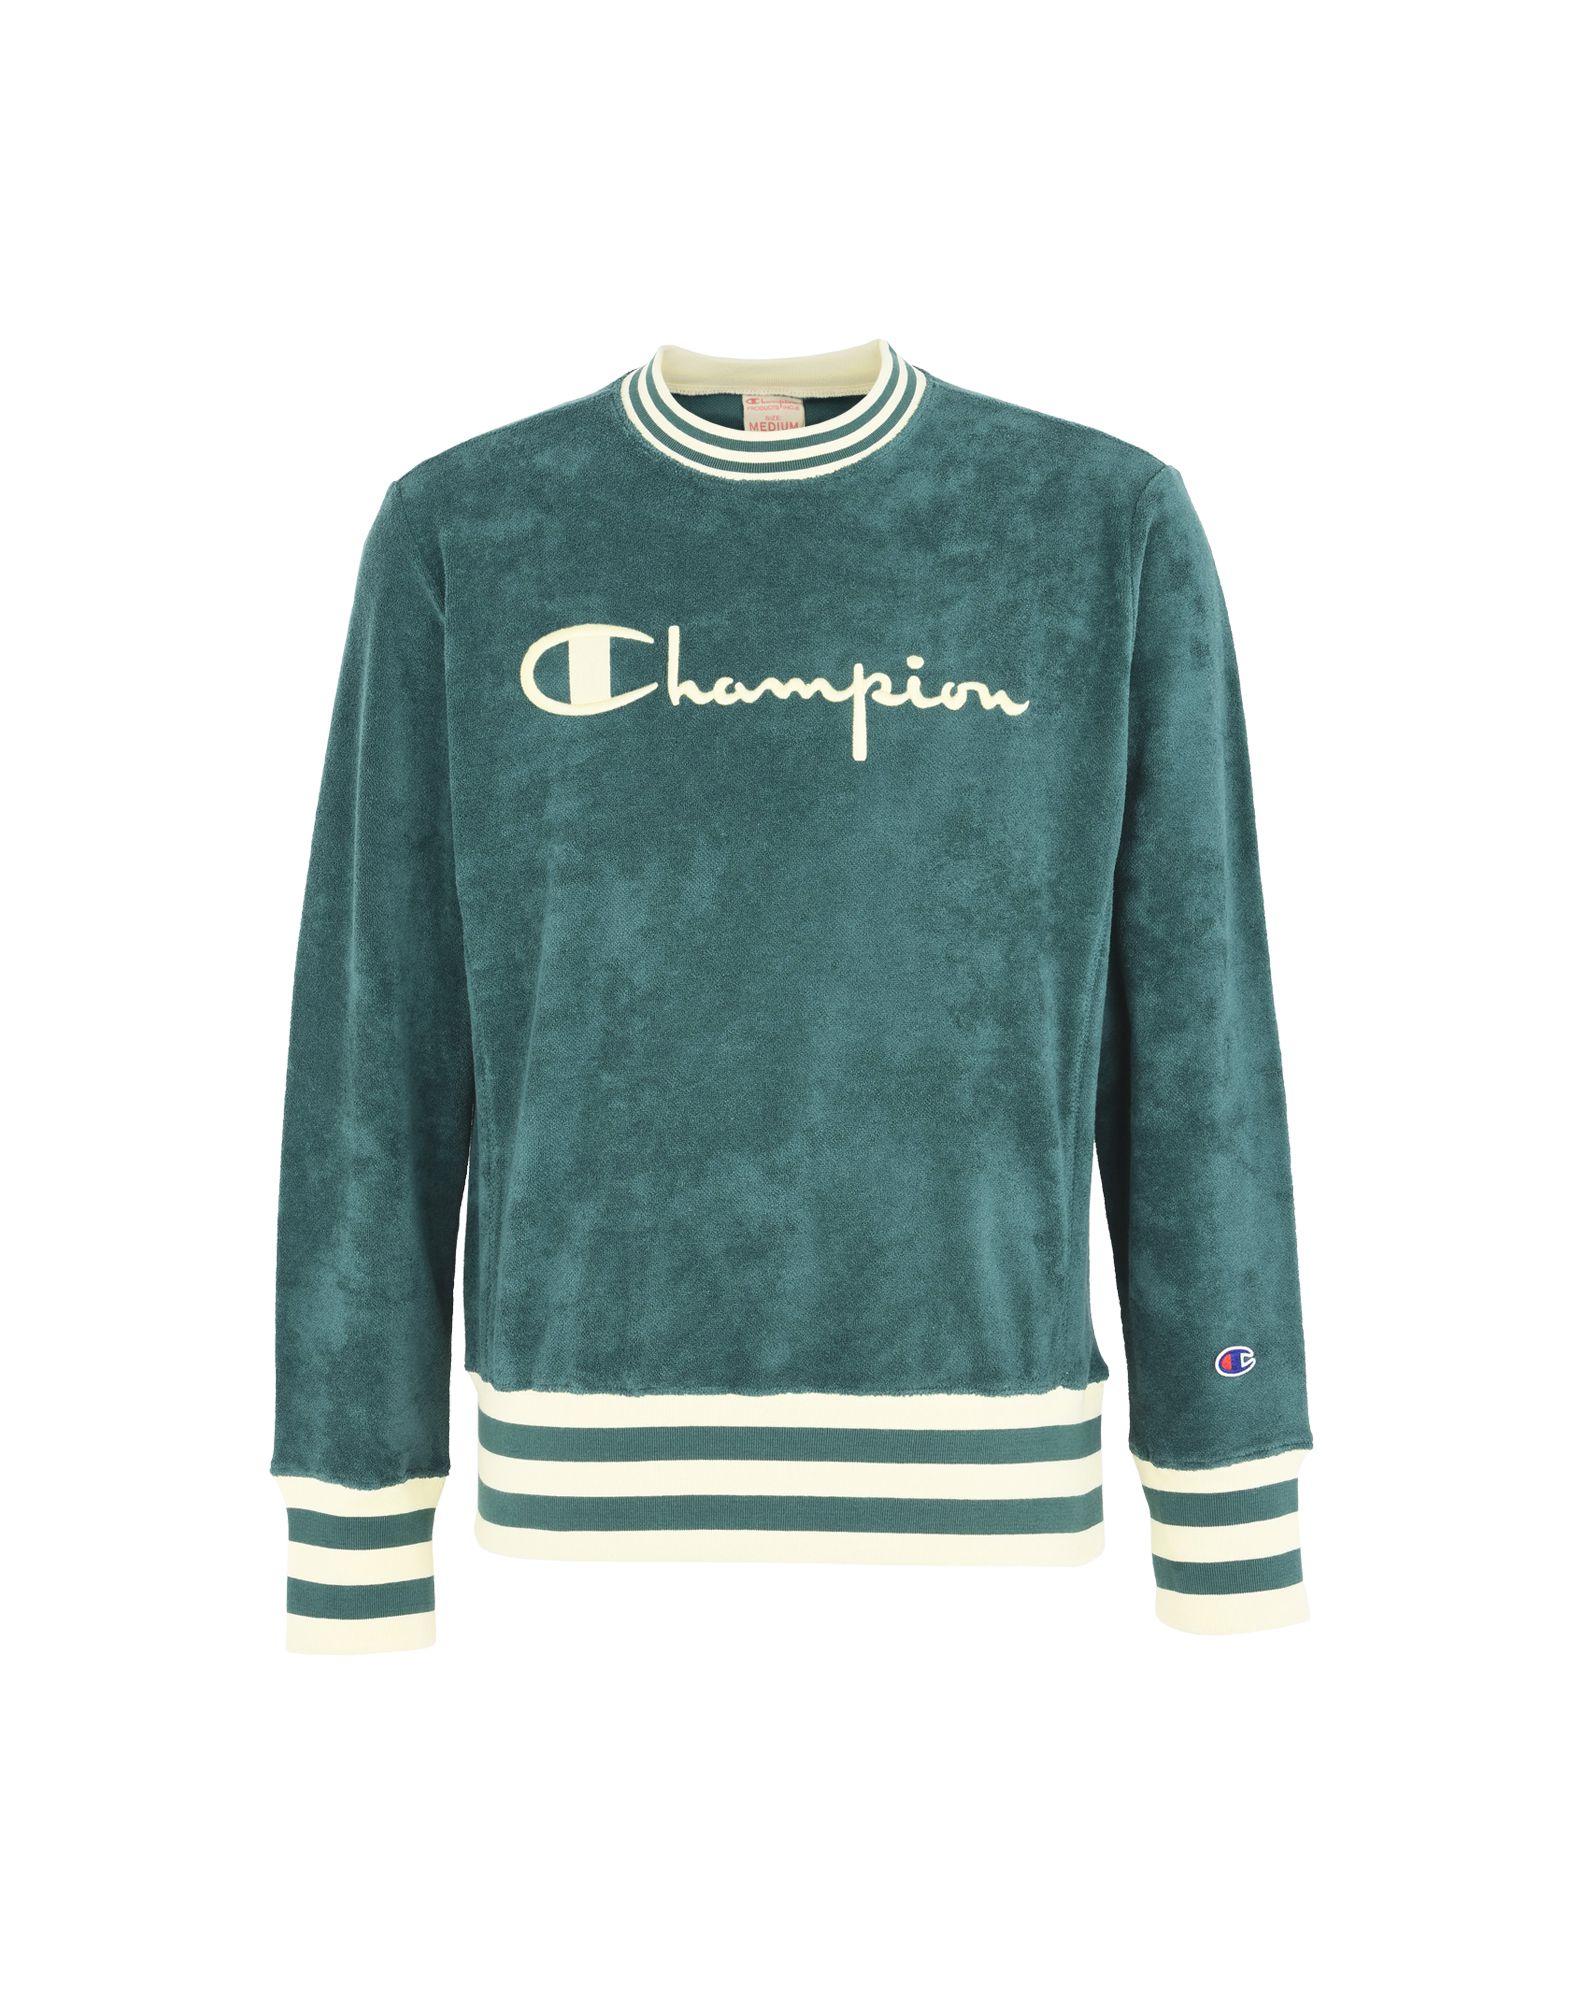 Felpa Champion Reverse Weave Striped Sponge Crewneck Sweatshirt - Uomo - Acquista online su